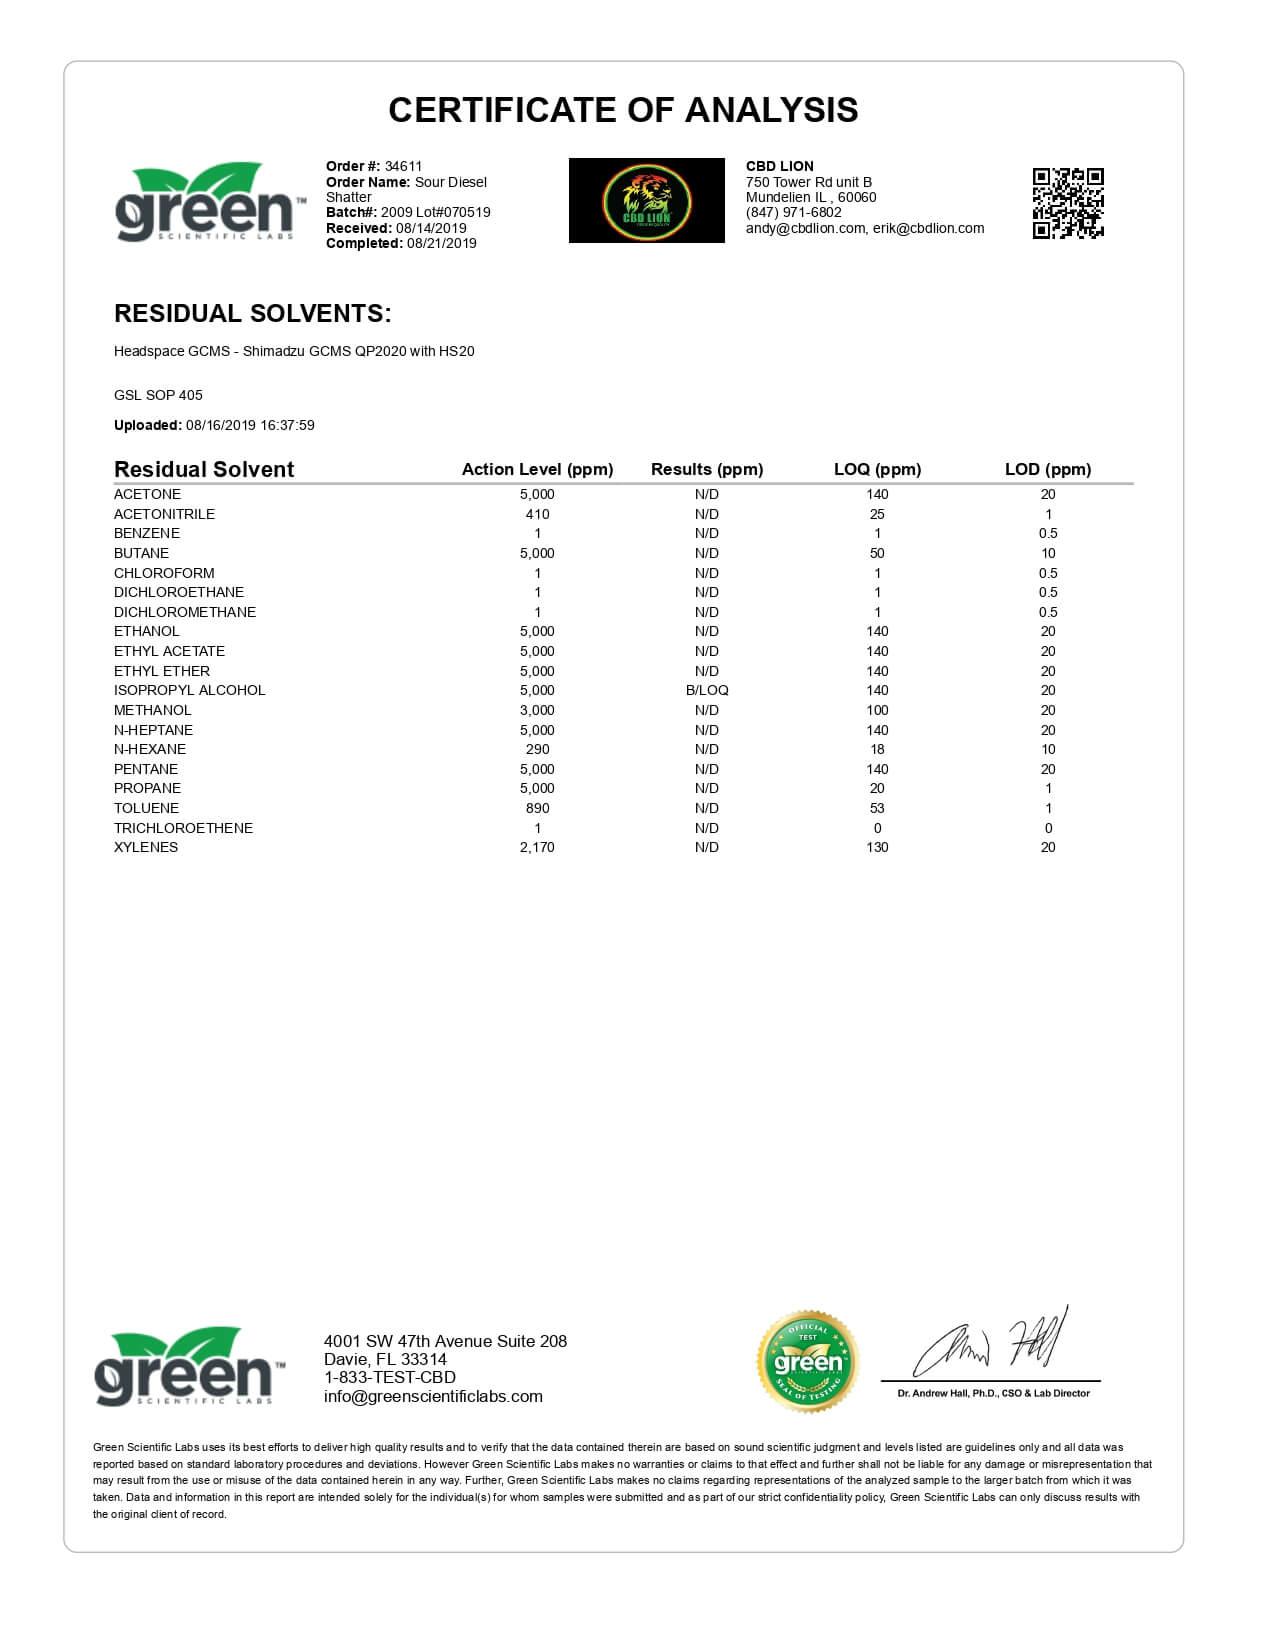 CBD Lion CBD Concentrate Sour Diesel Shatter 1g Lab Report